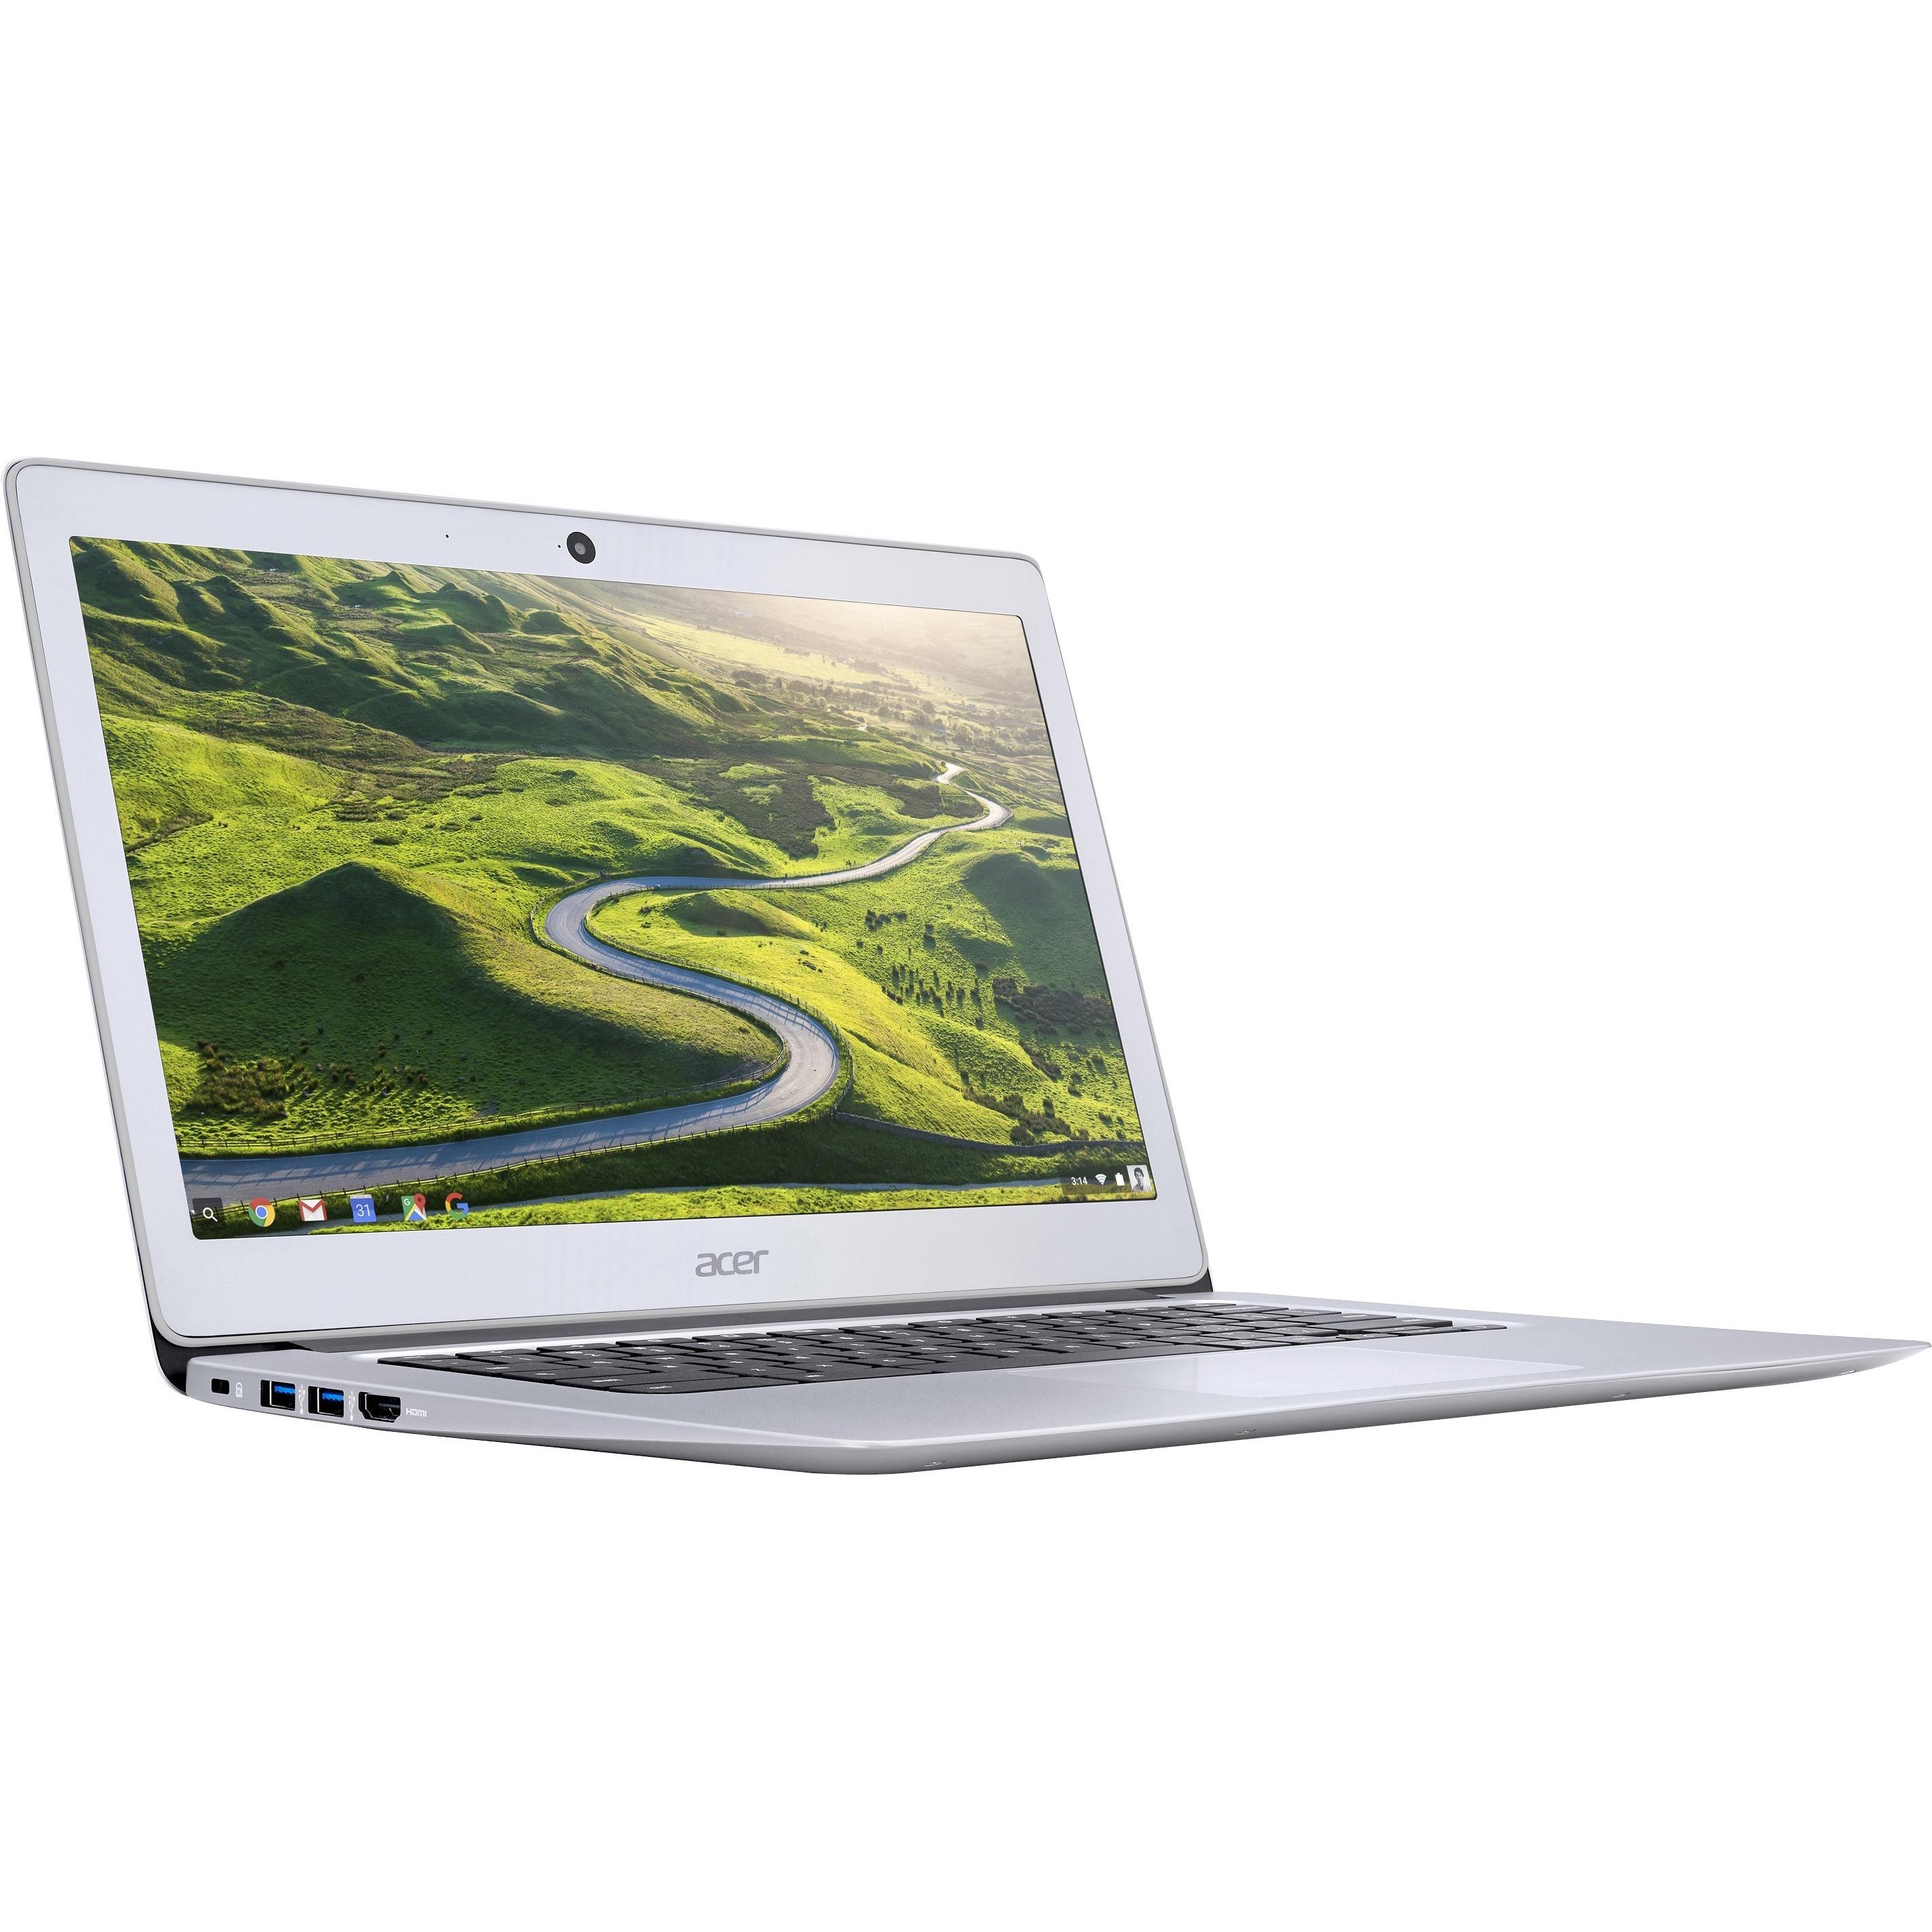 Acer CB3-431-C31R 35.6 cm 14inch LCD Chromebook - Intel Celeron N3060 Dual-core 2 Core 1.60 GHz